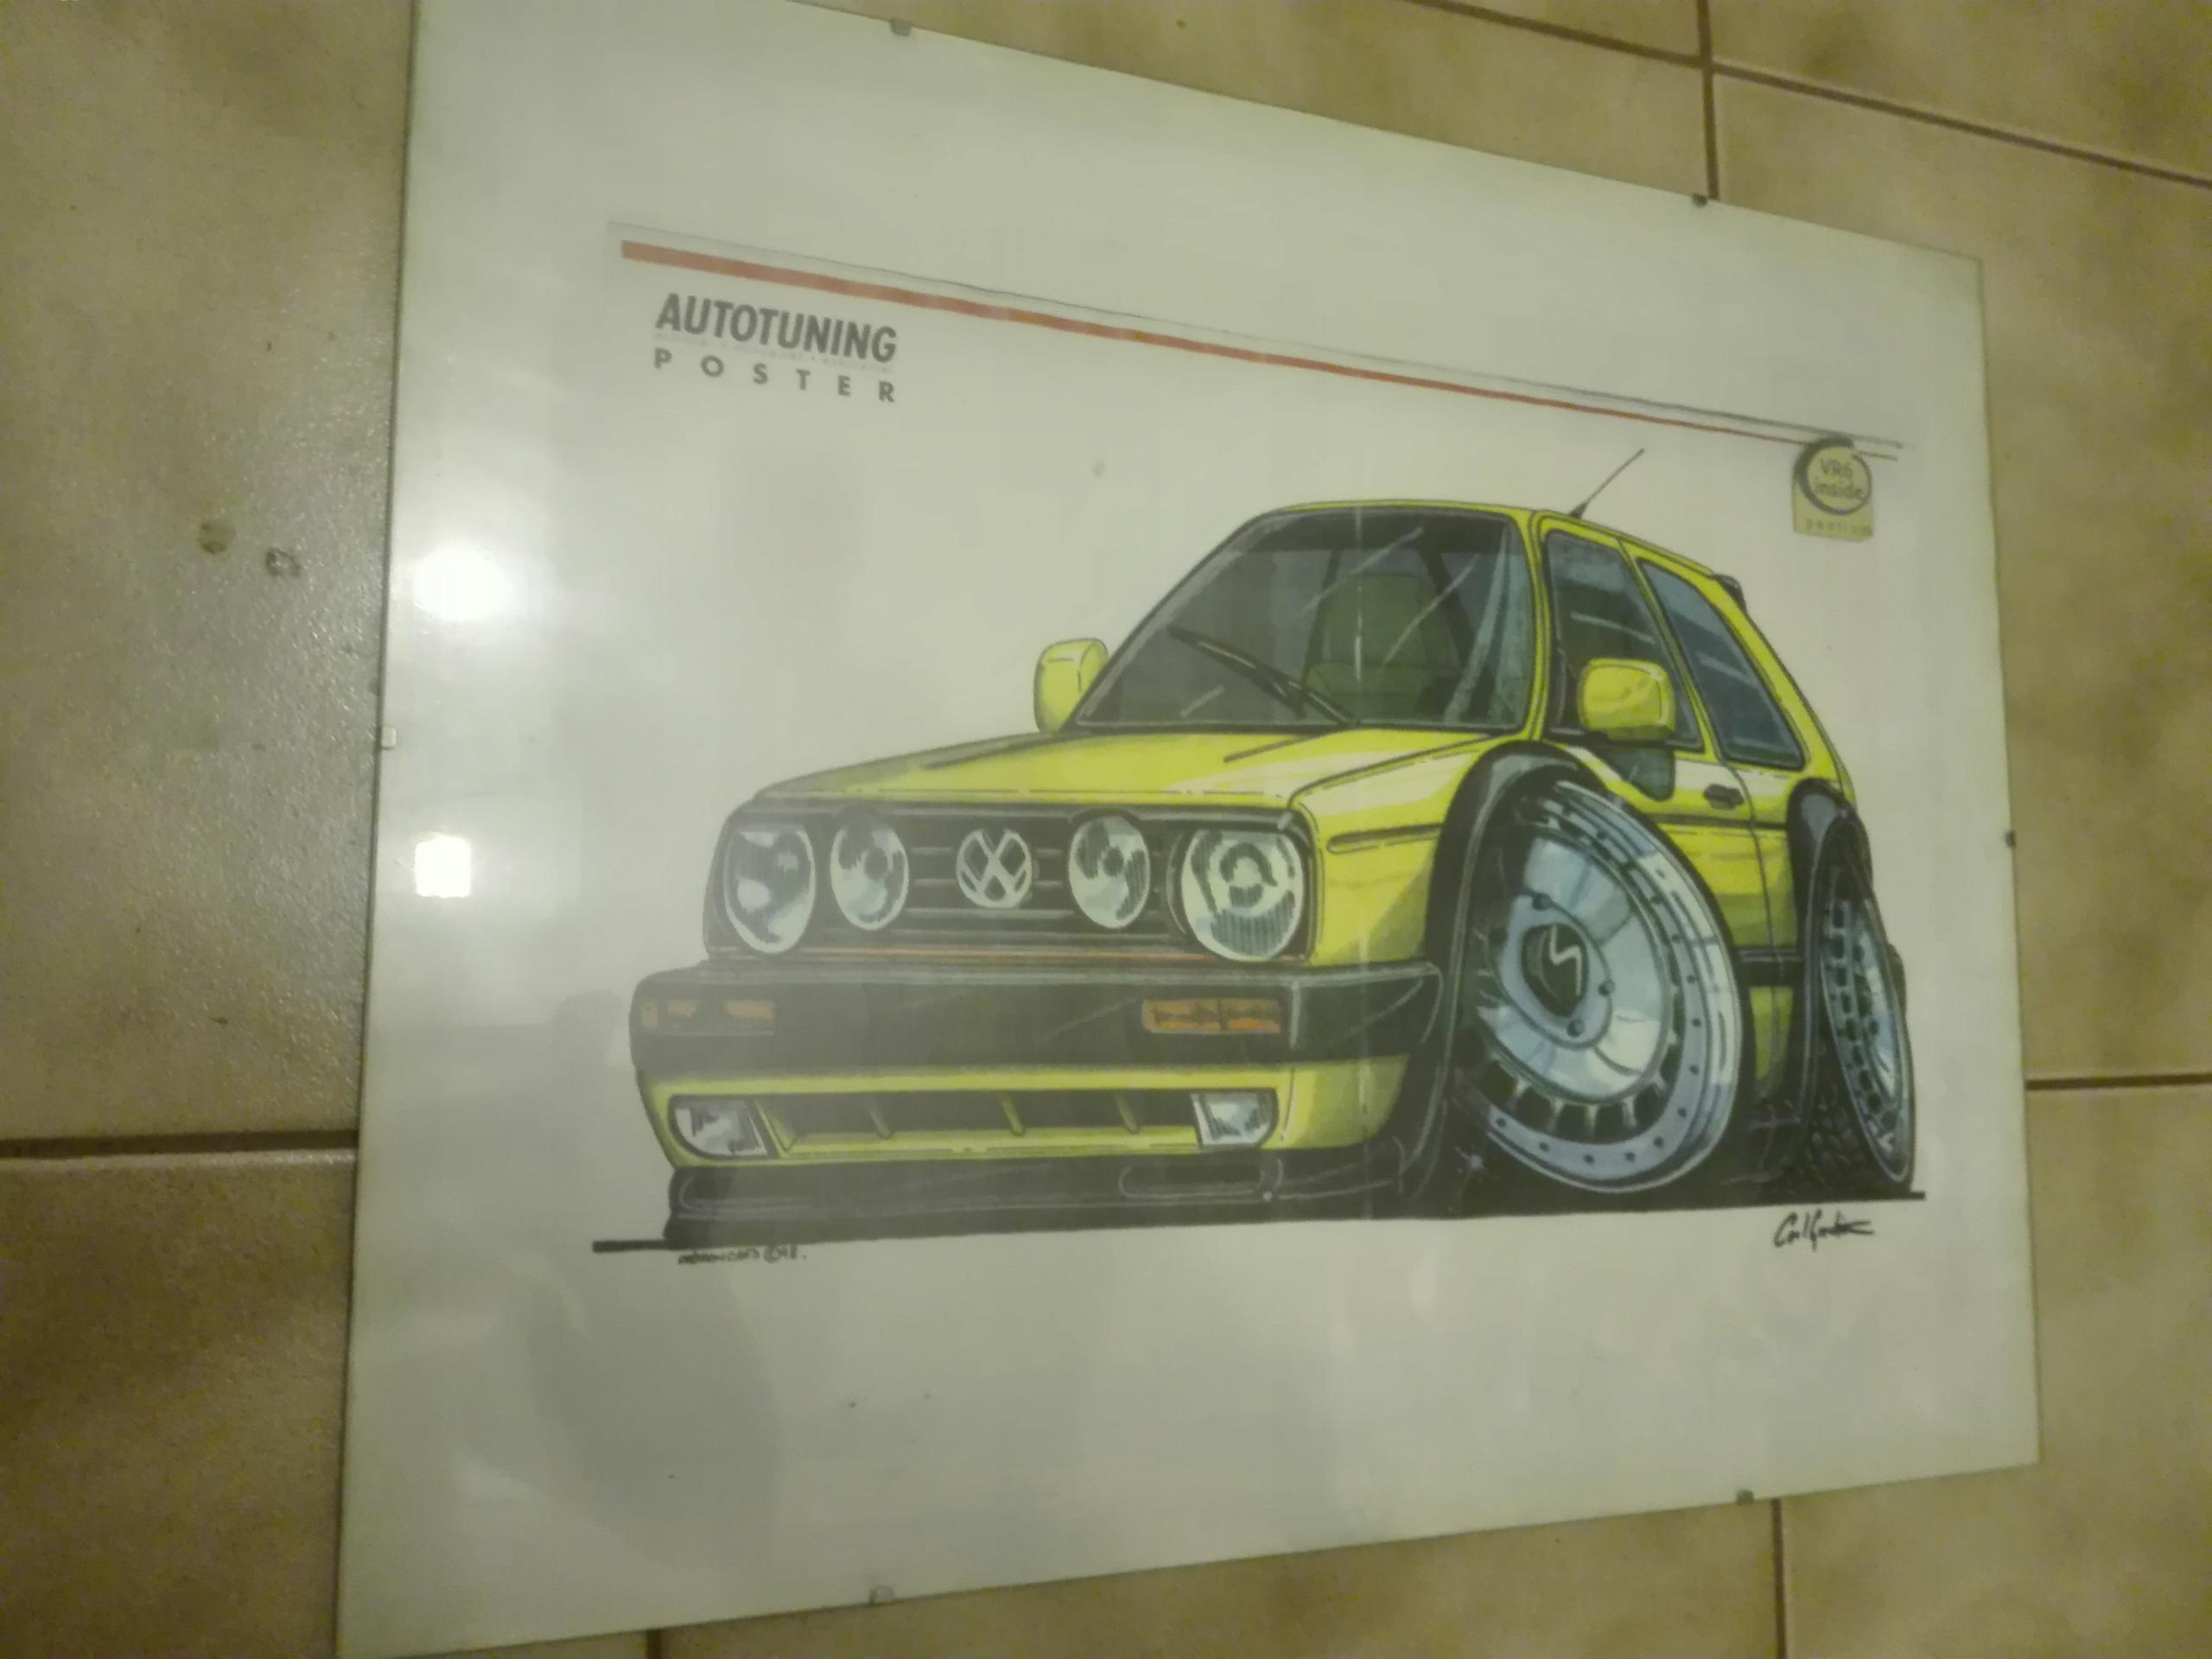 Vw Golf Ii Plakat Jak Z Komiksu Tuning 8060546088 Allegro Pl